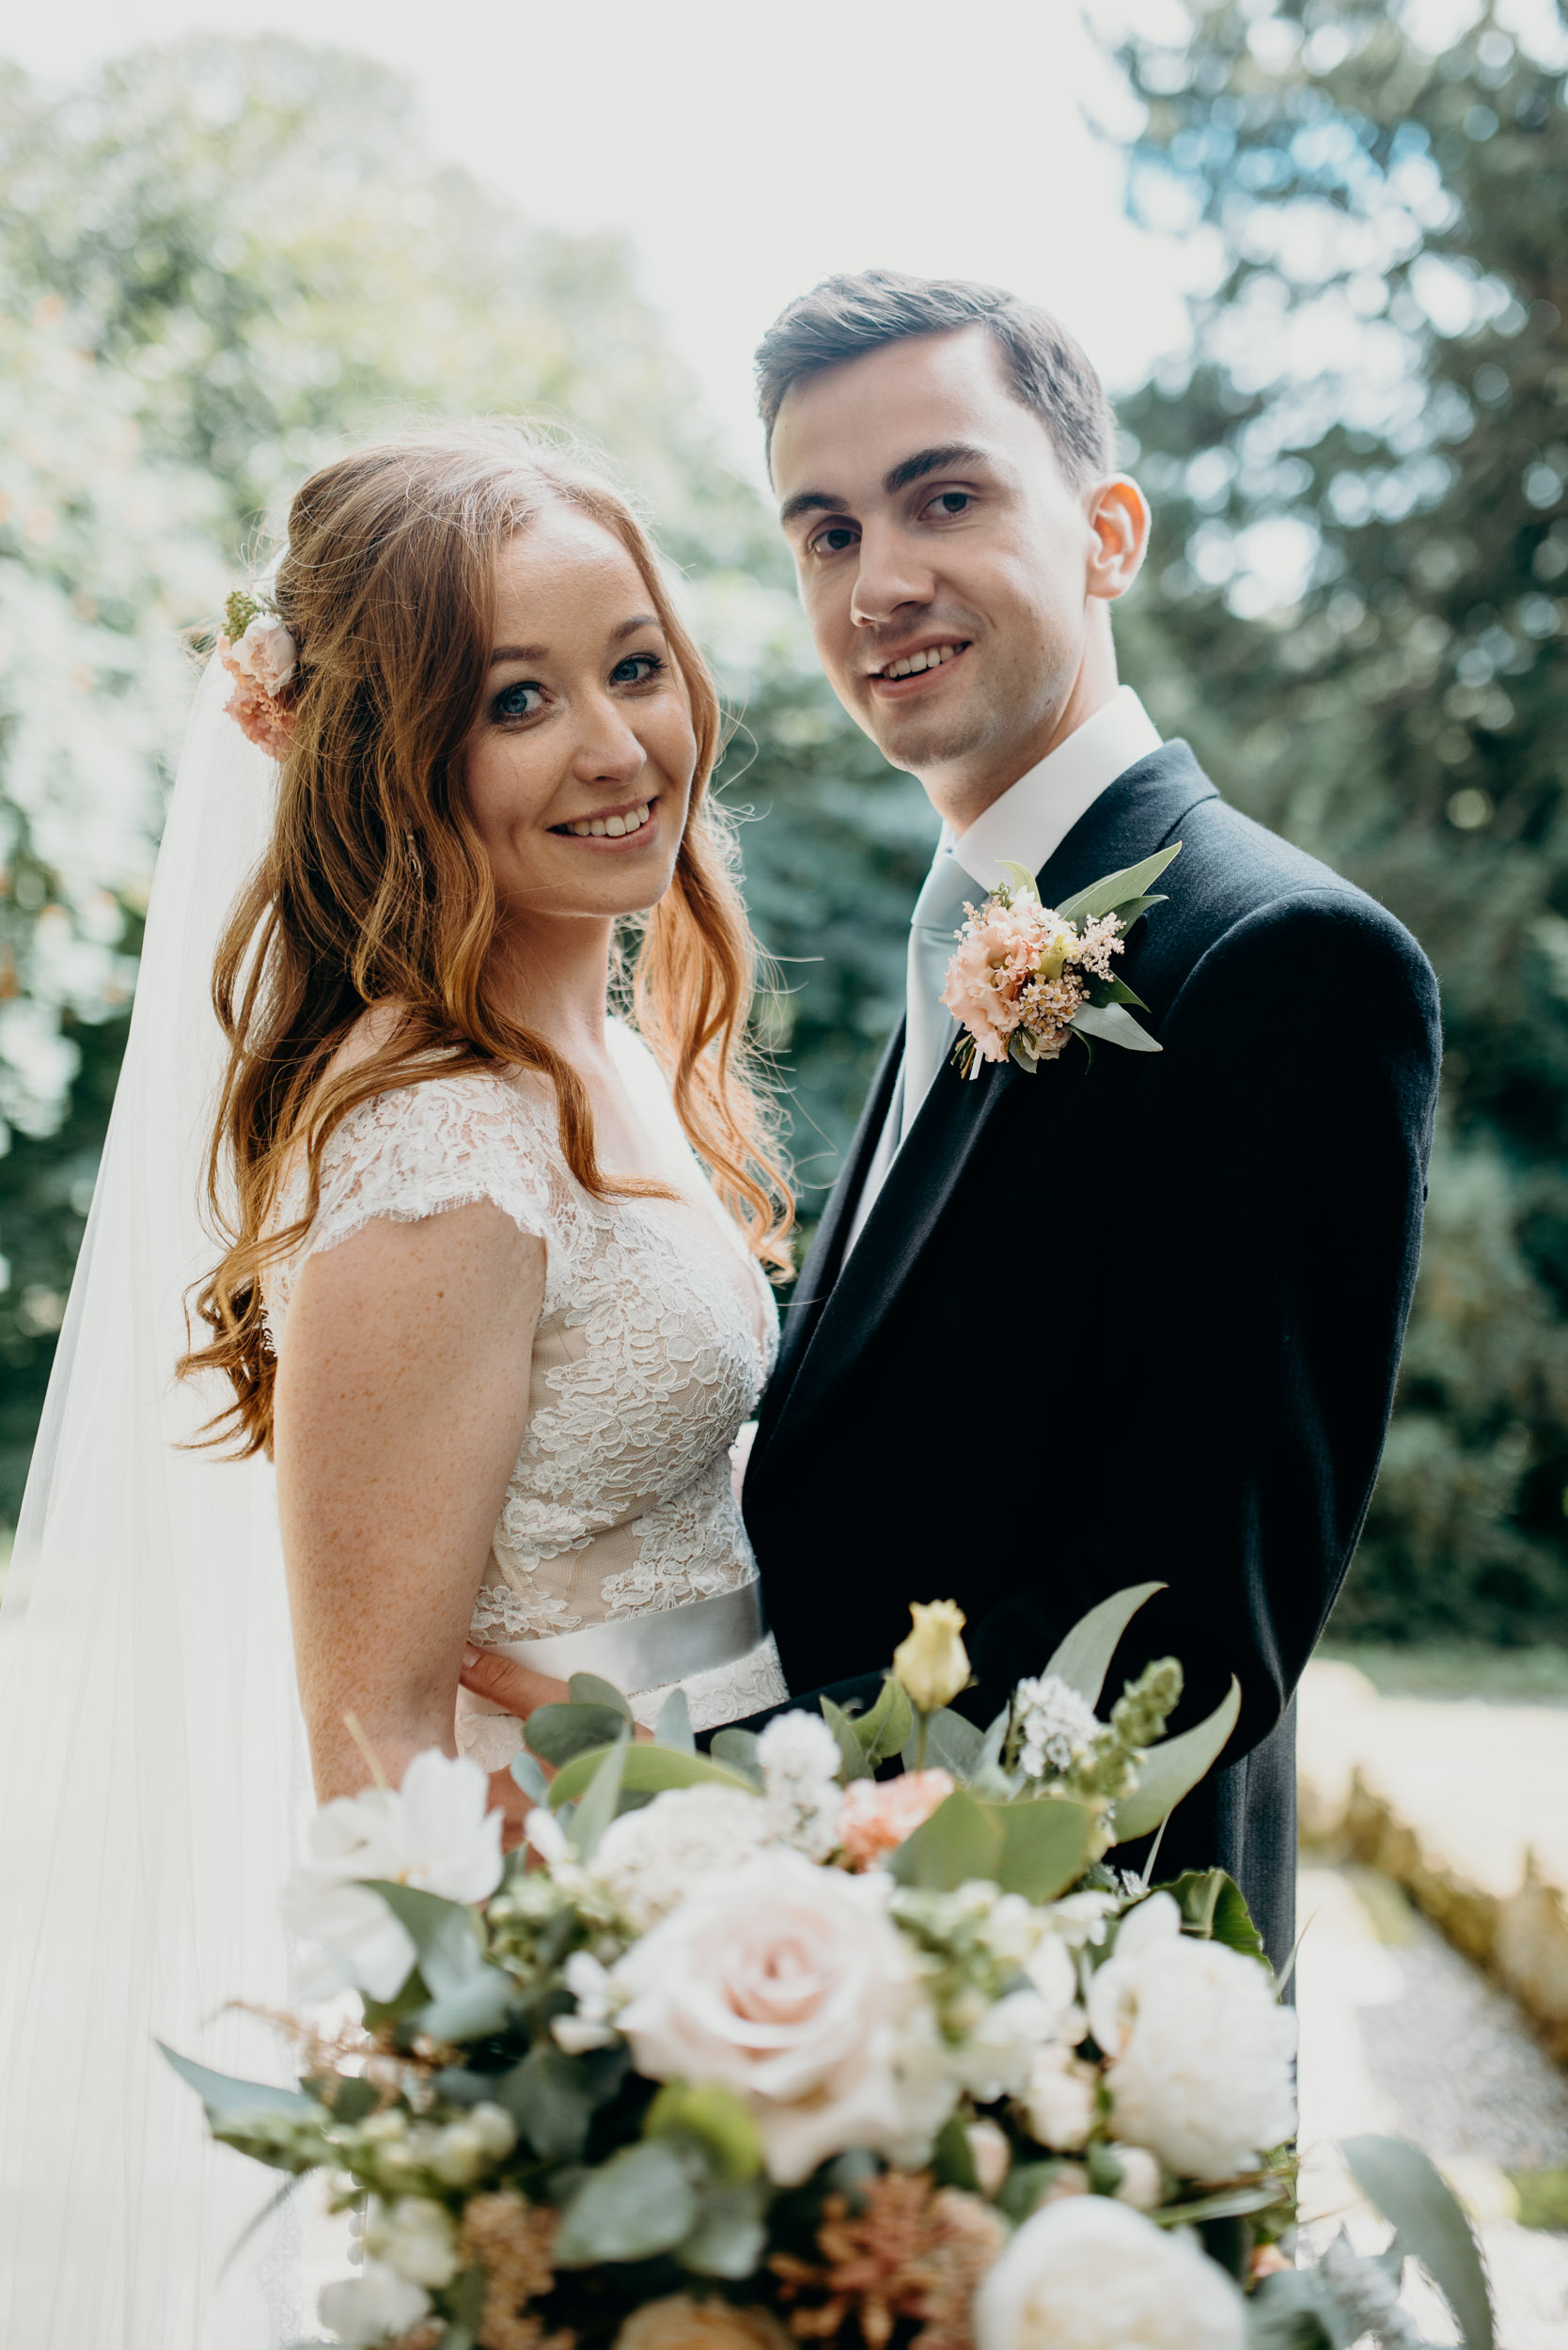 drenagh estate wedding photography-79.jpg